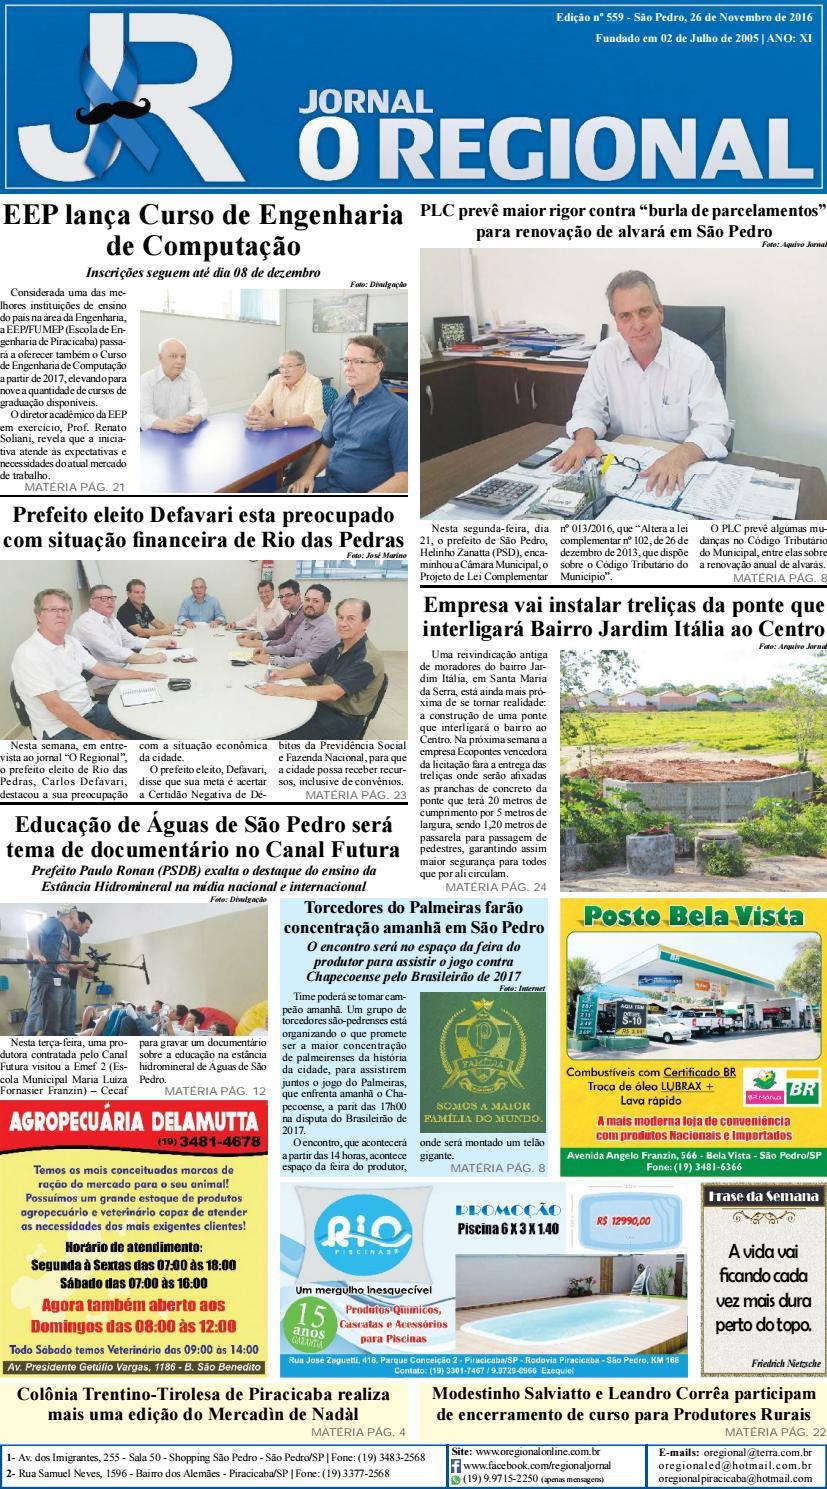 1337fb243 Jornal o regional edição 559 26 11 2016 site (teste) by Jornal O Regional -  issuu